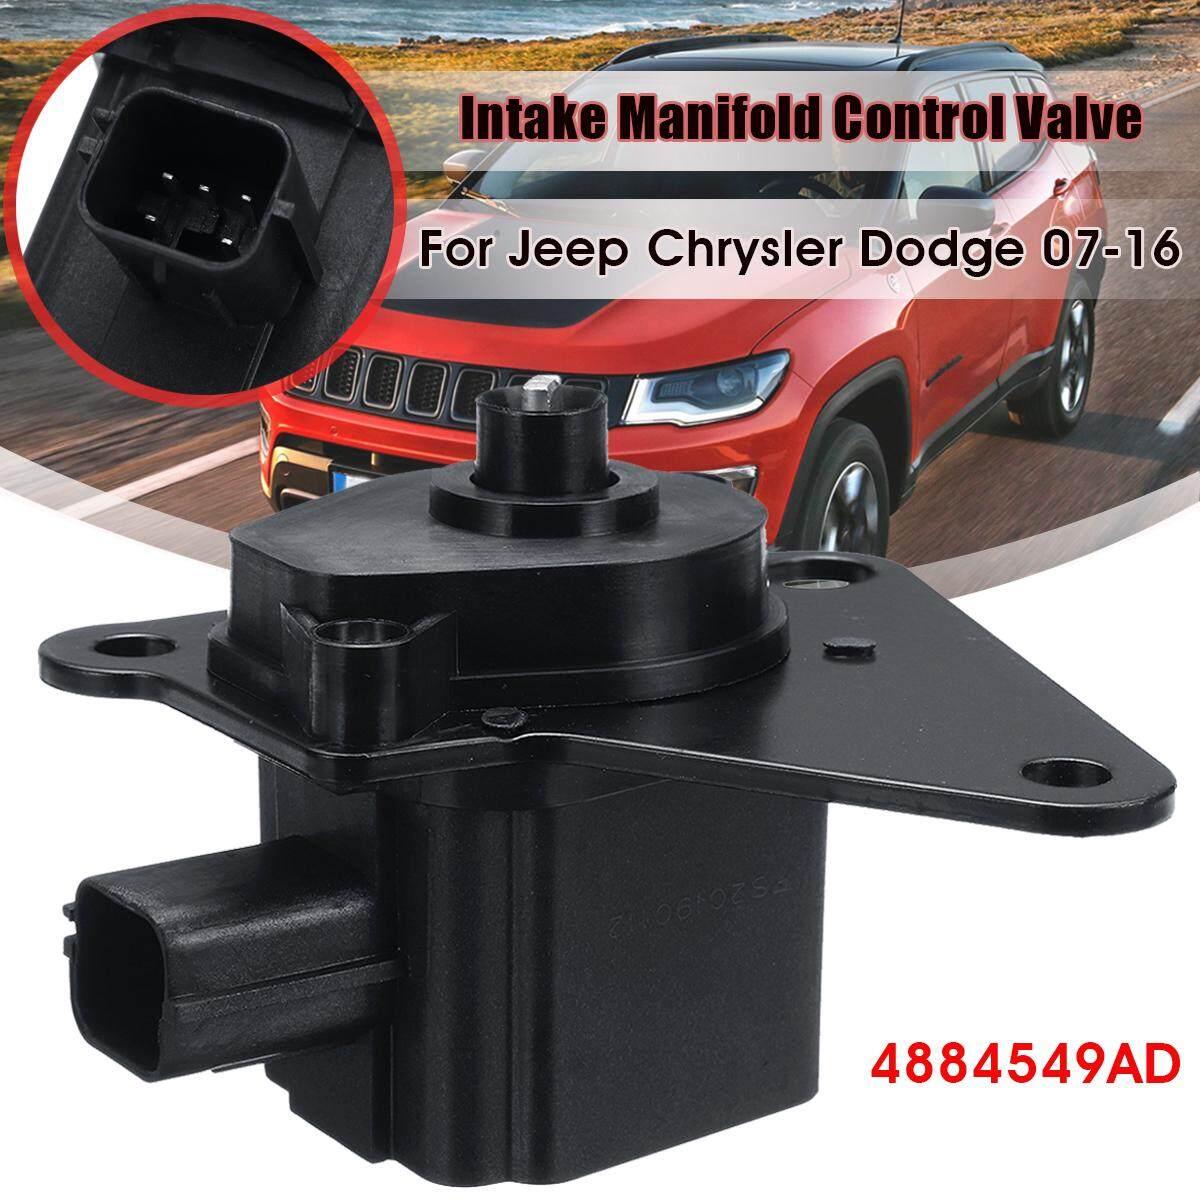 4884549ad Intake Manifold Runner Katup Kontrol Untuk Jeep Chrysler Dodge 2.0 2.4 By Autoleader.